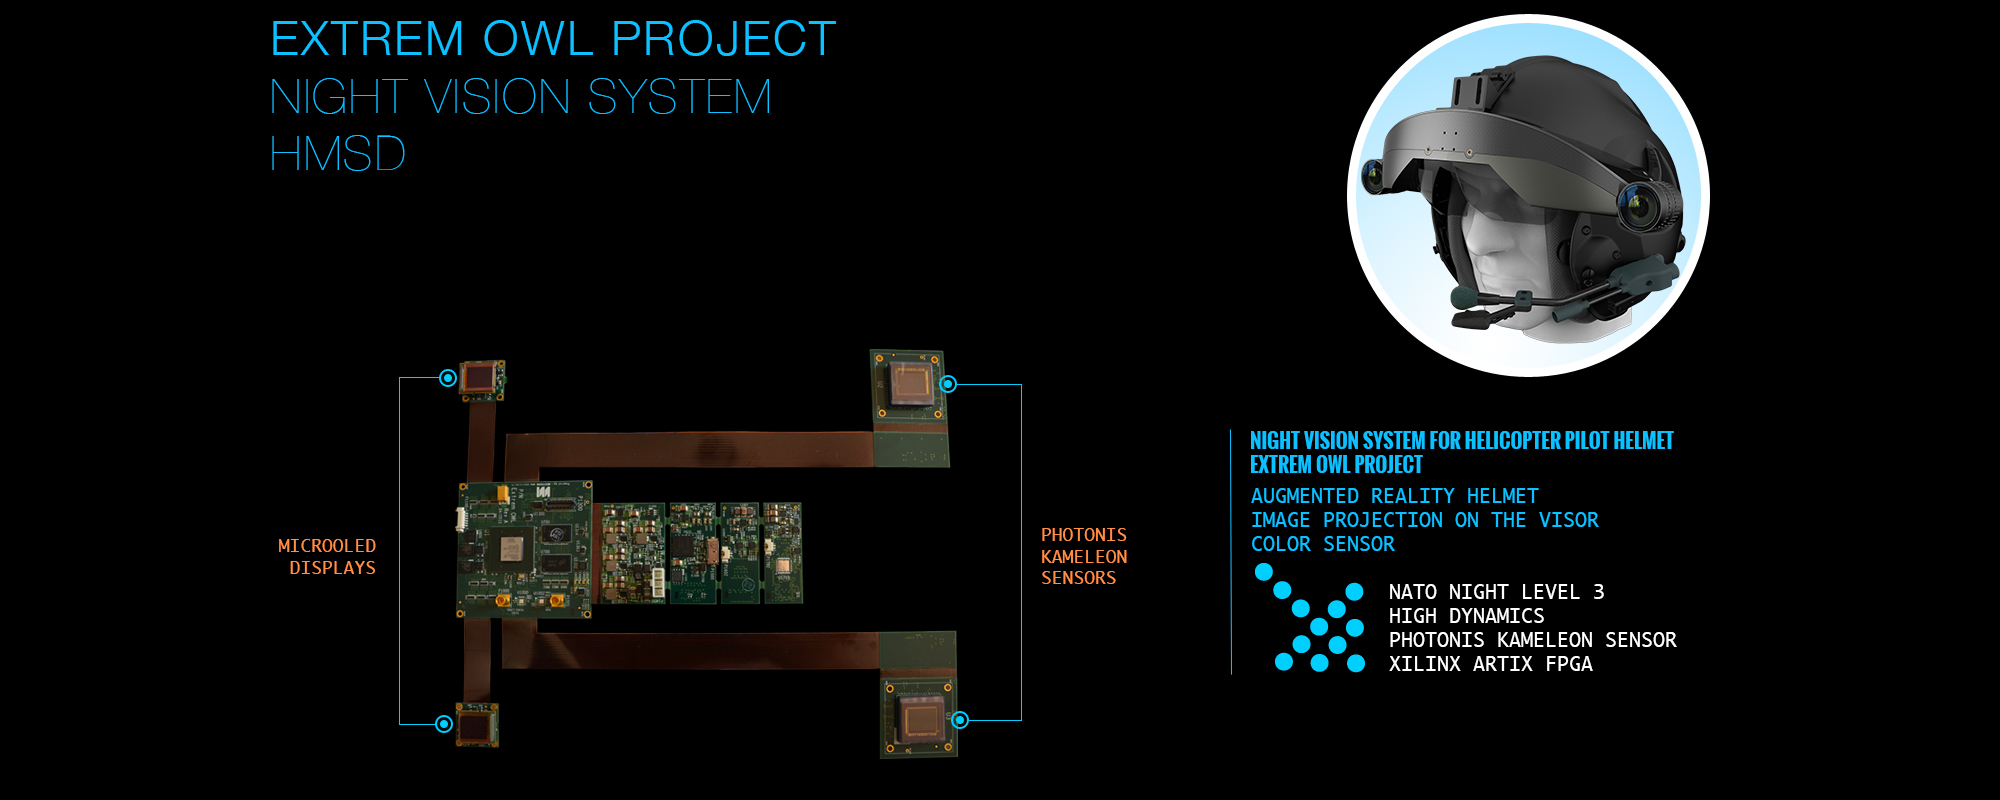 Vision solution & optronic system UV night SWIR LWIR Terahertz